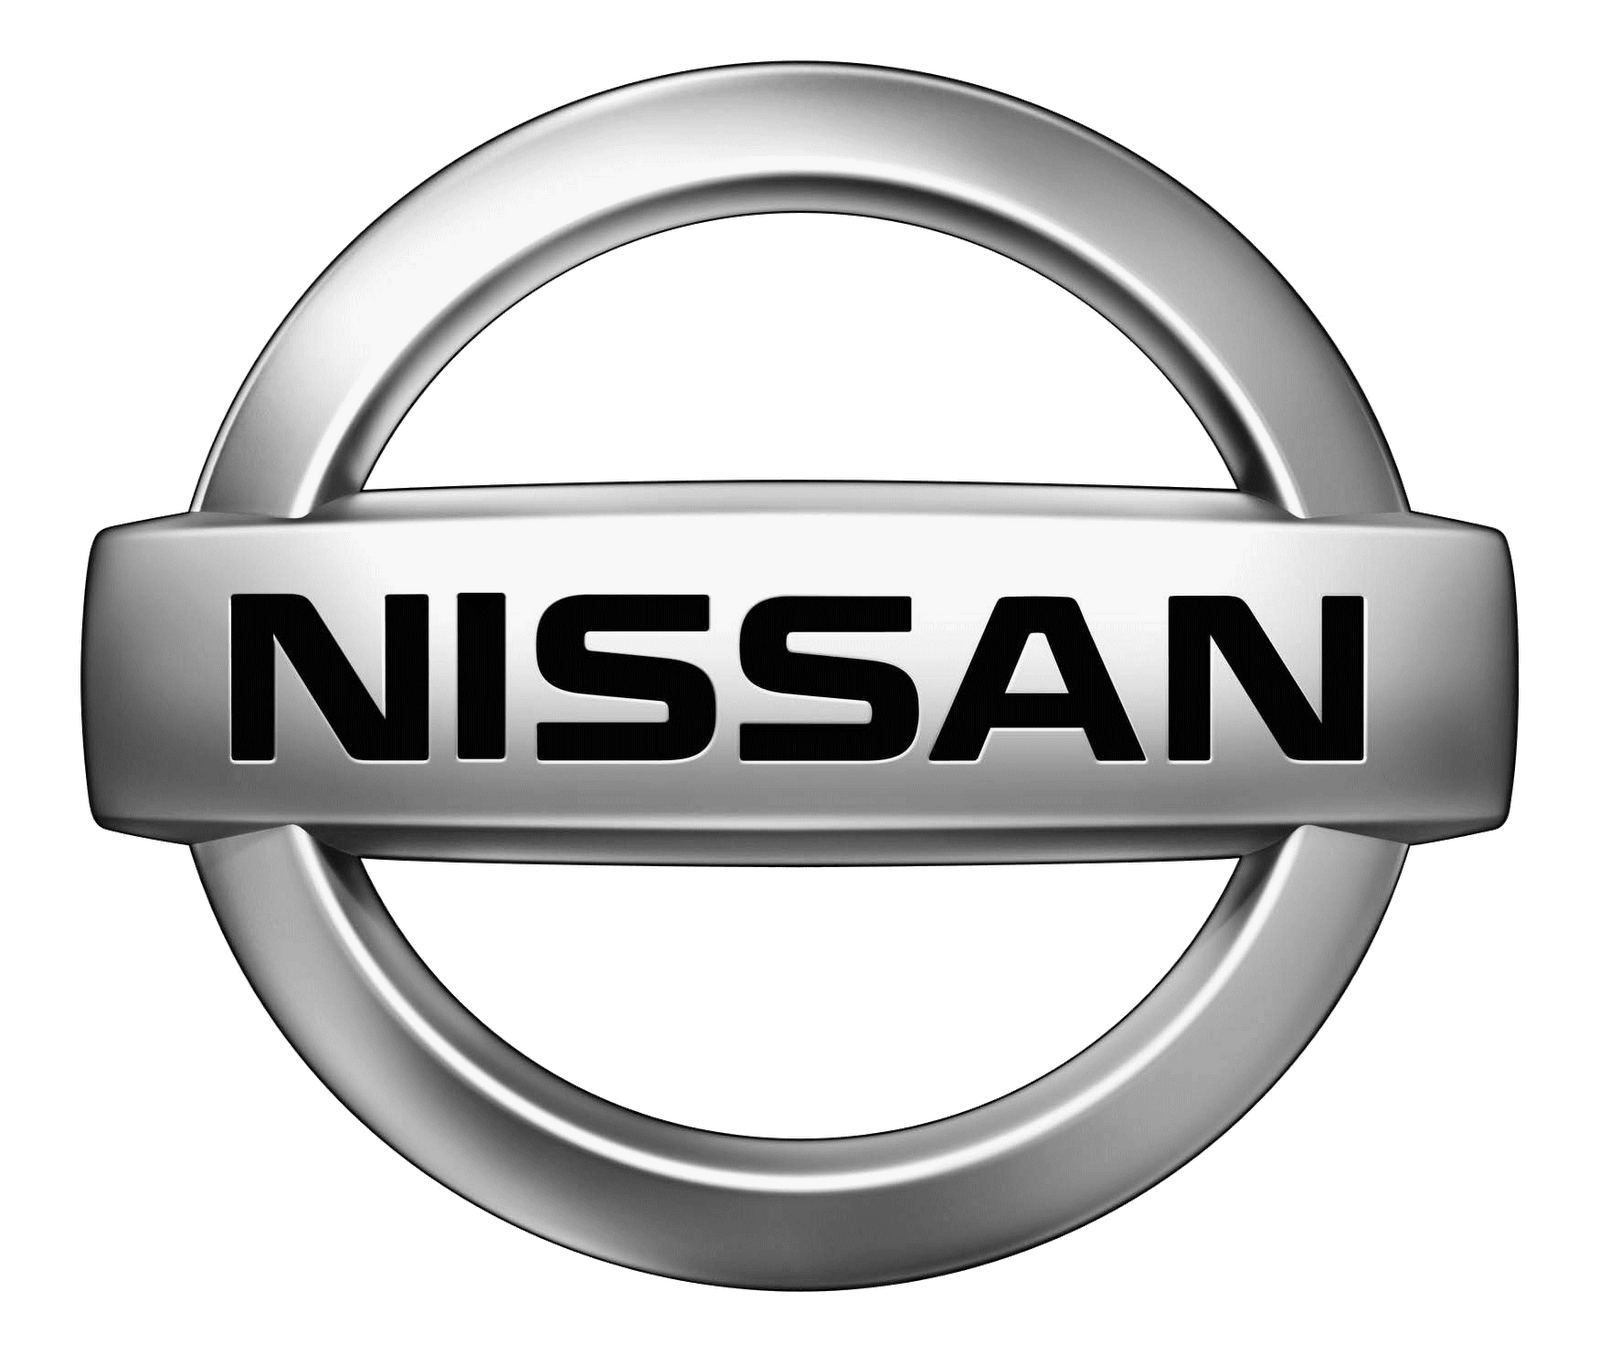 nissan logo transparent. nissan logo transparent r